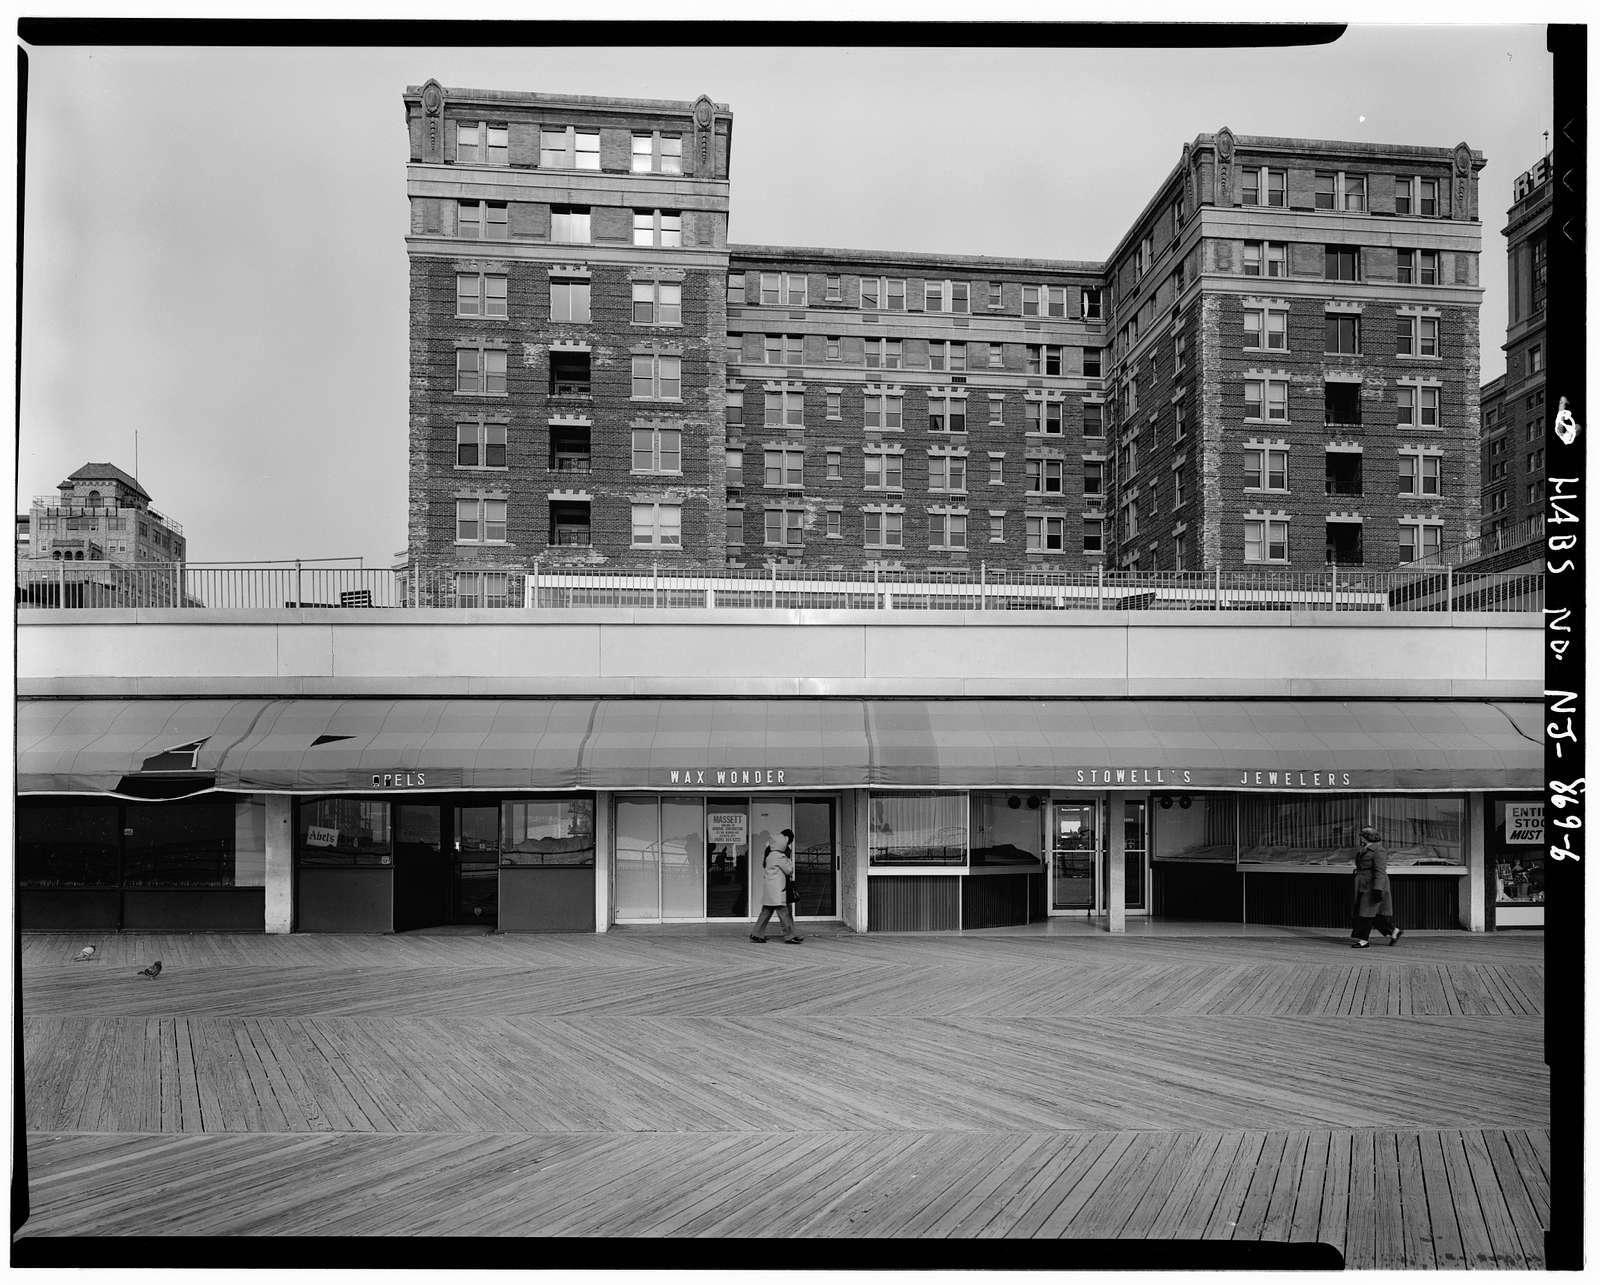 Chalfonte Hotel, Pacific & North Carolina Avenues, Atlantic City, Atlantic County, NJ